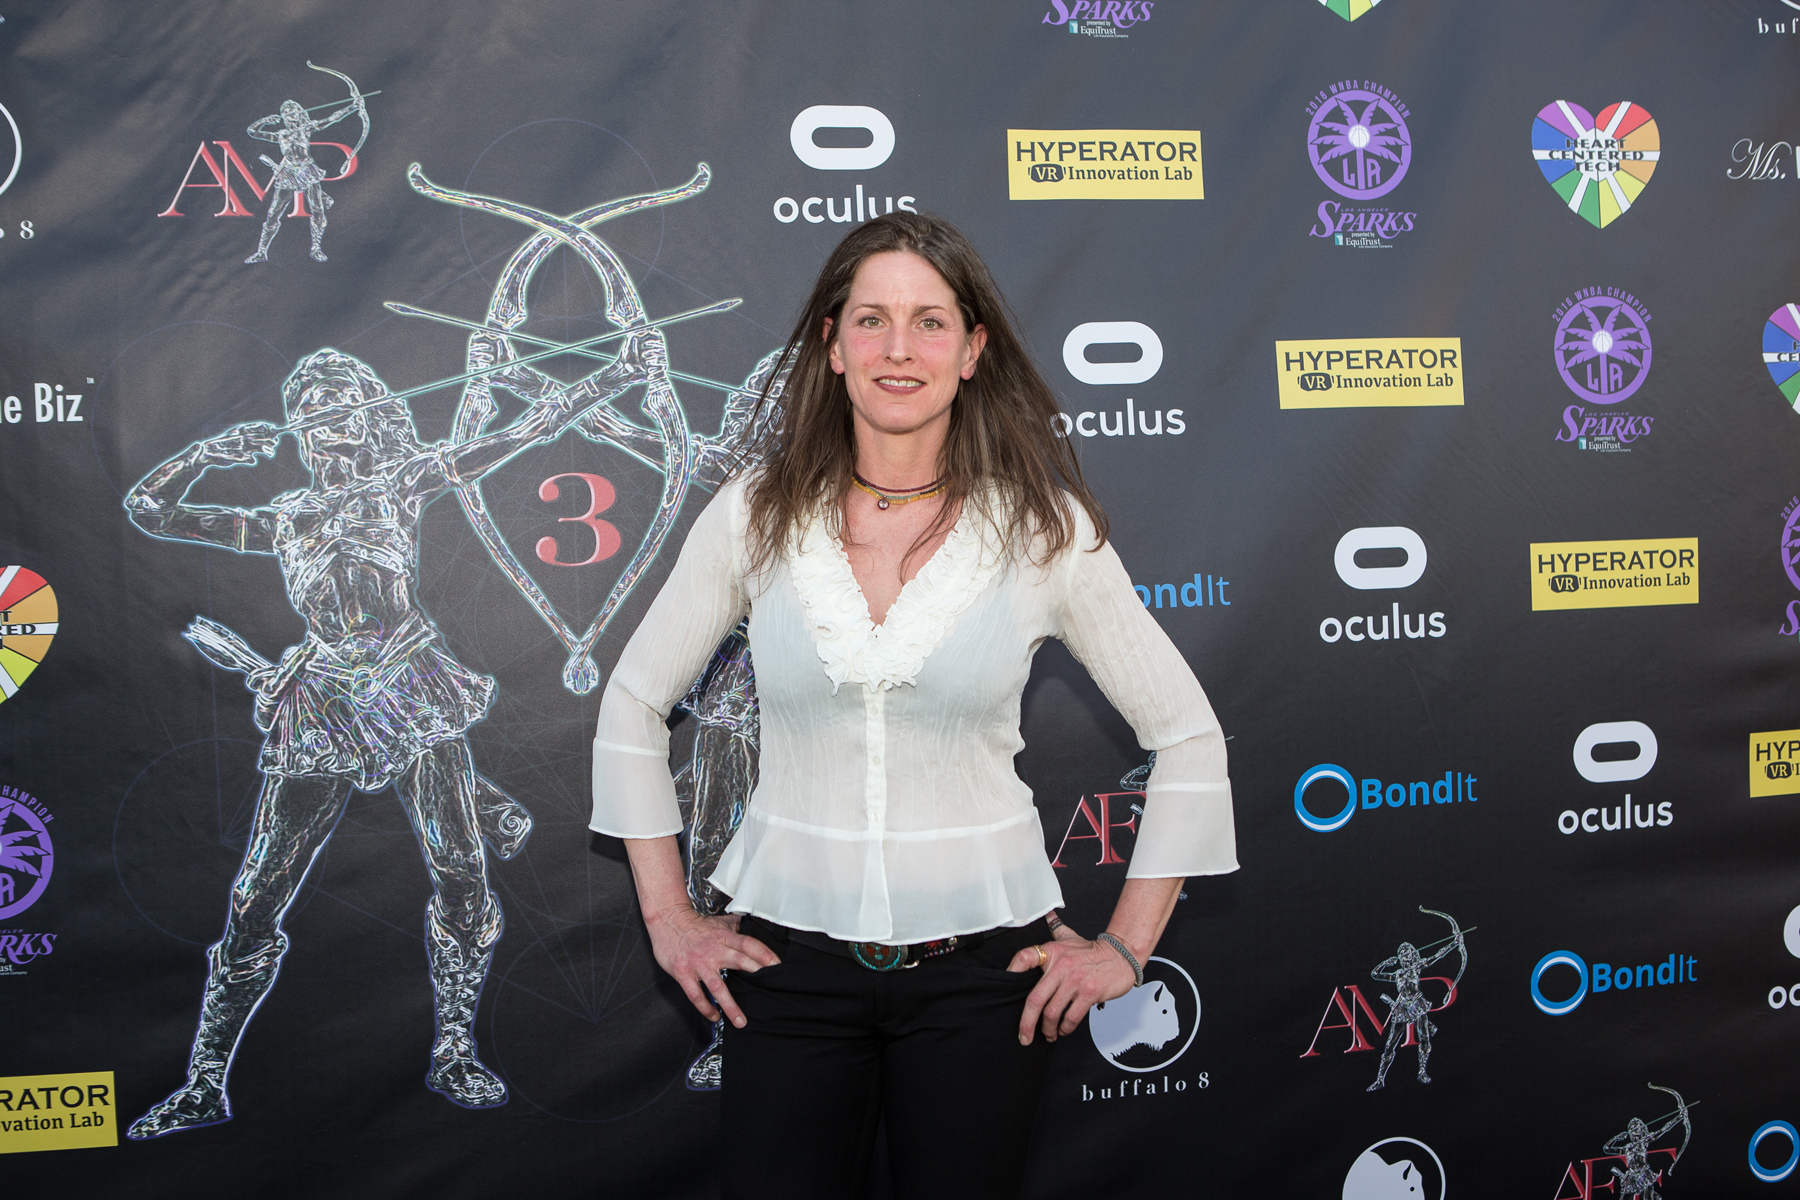 Melanie Wise